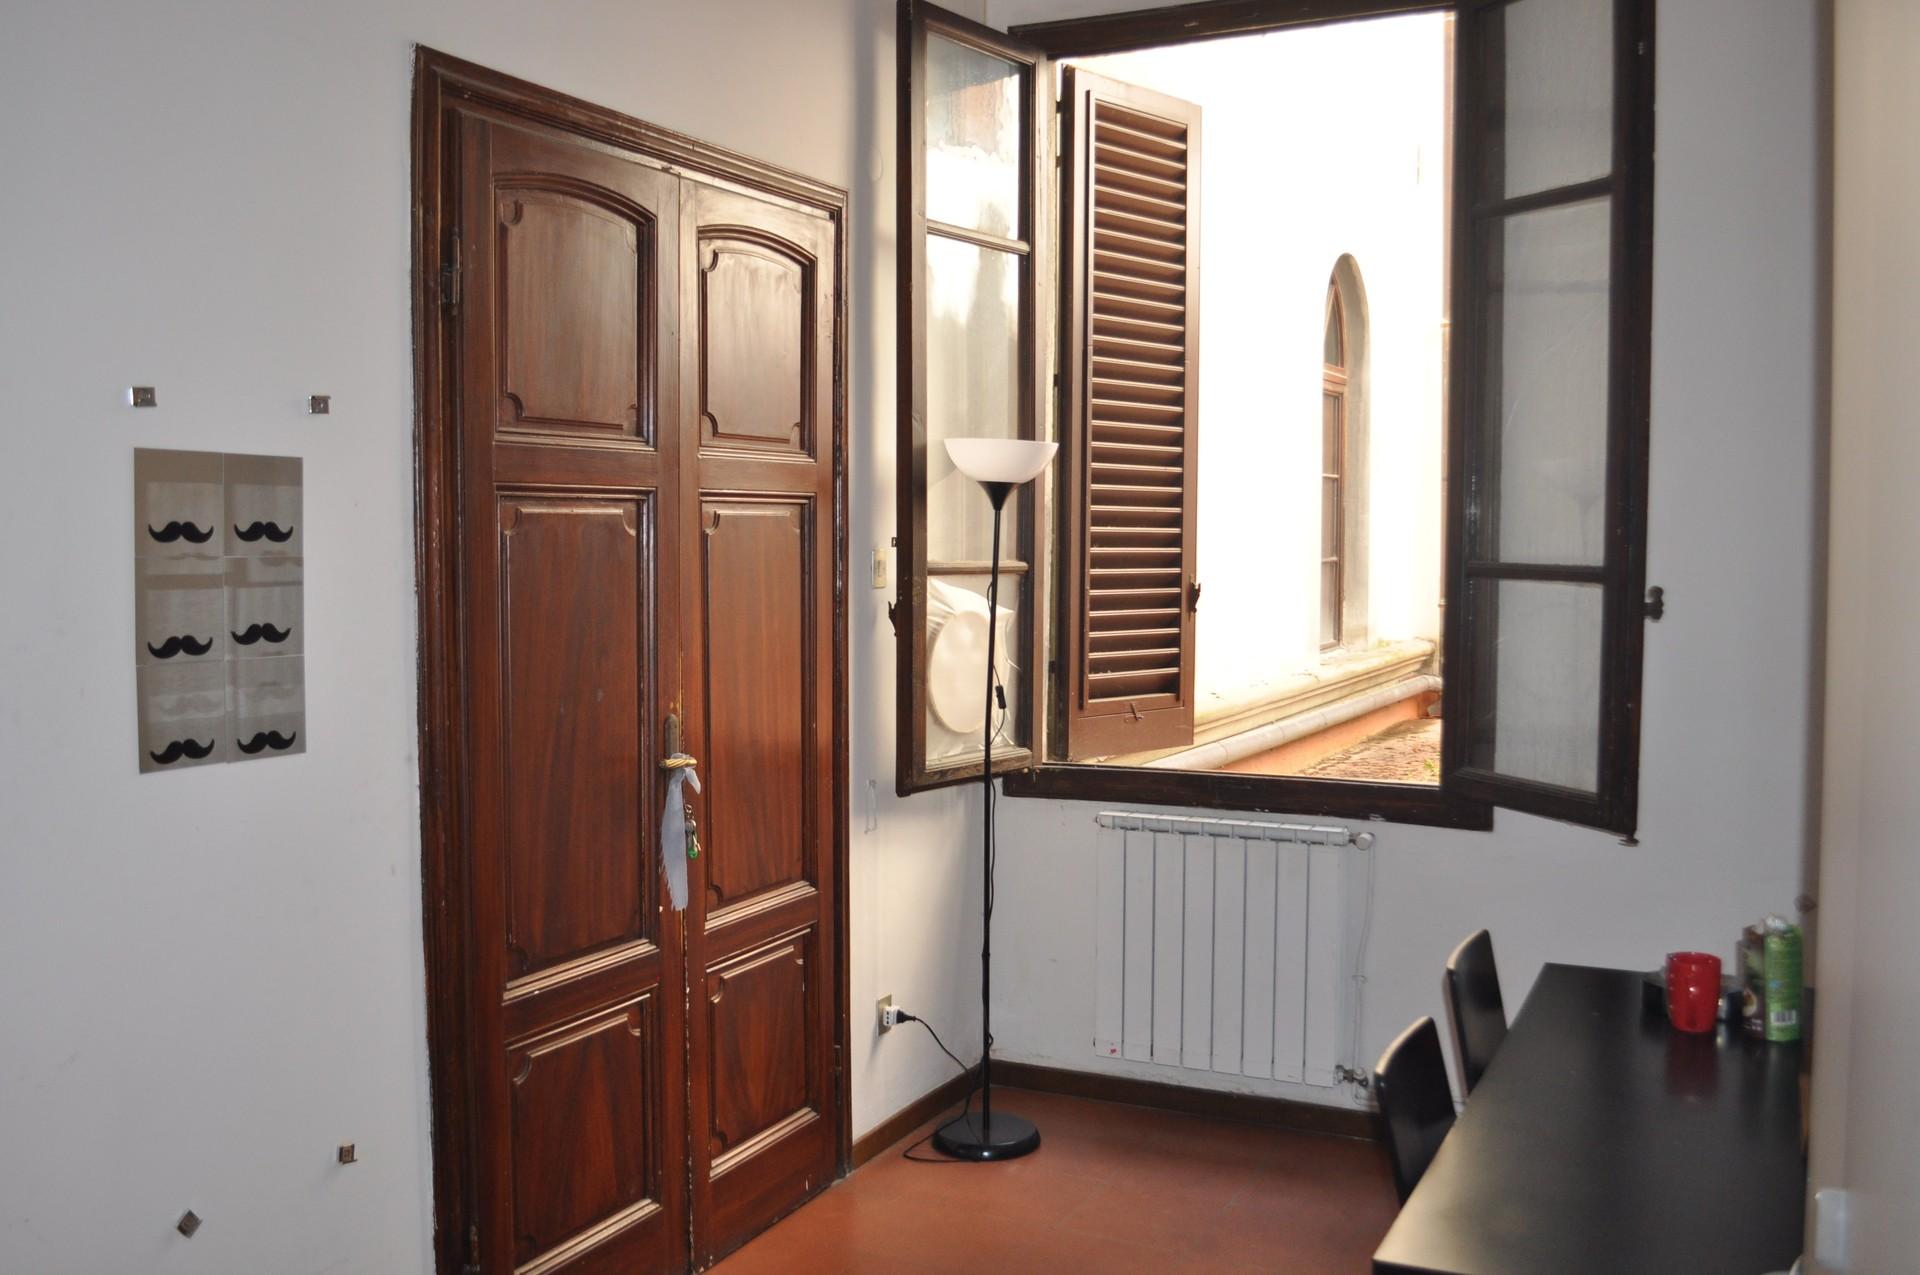 Camera singola centro storico firenze quartiere duomo - Centro cucina firenze ...